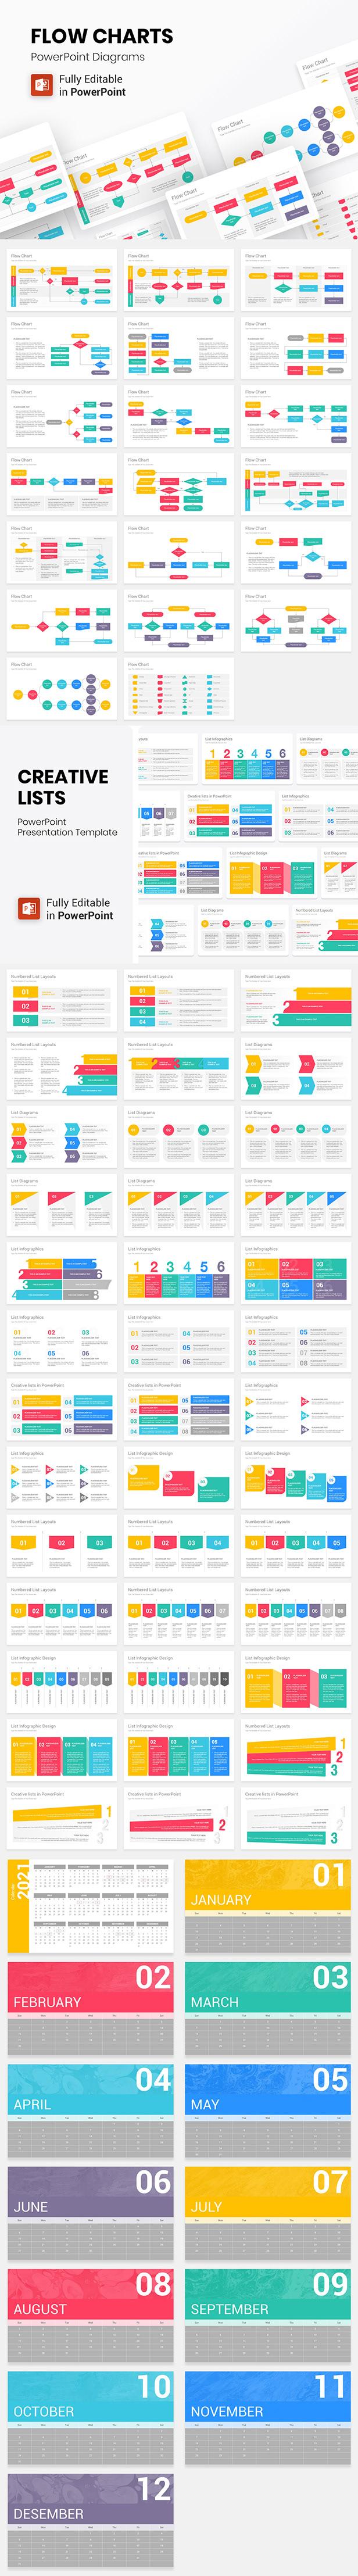 Slide Deck - Multipurpose PowerPoint Template - 15